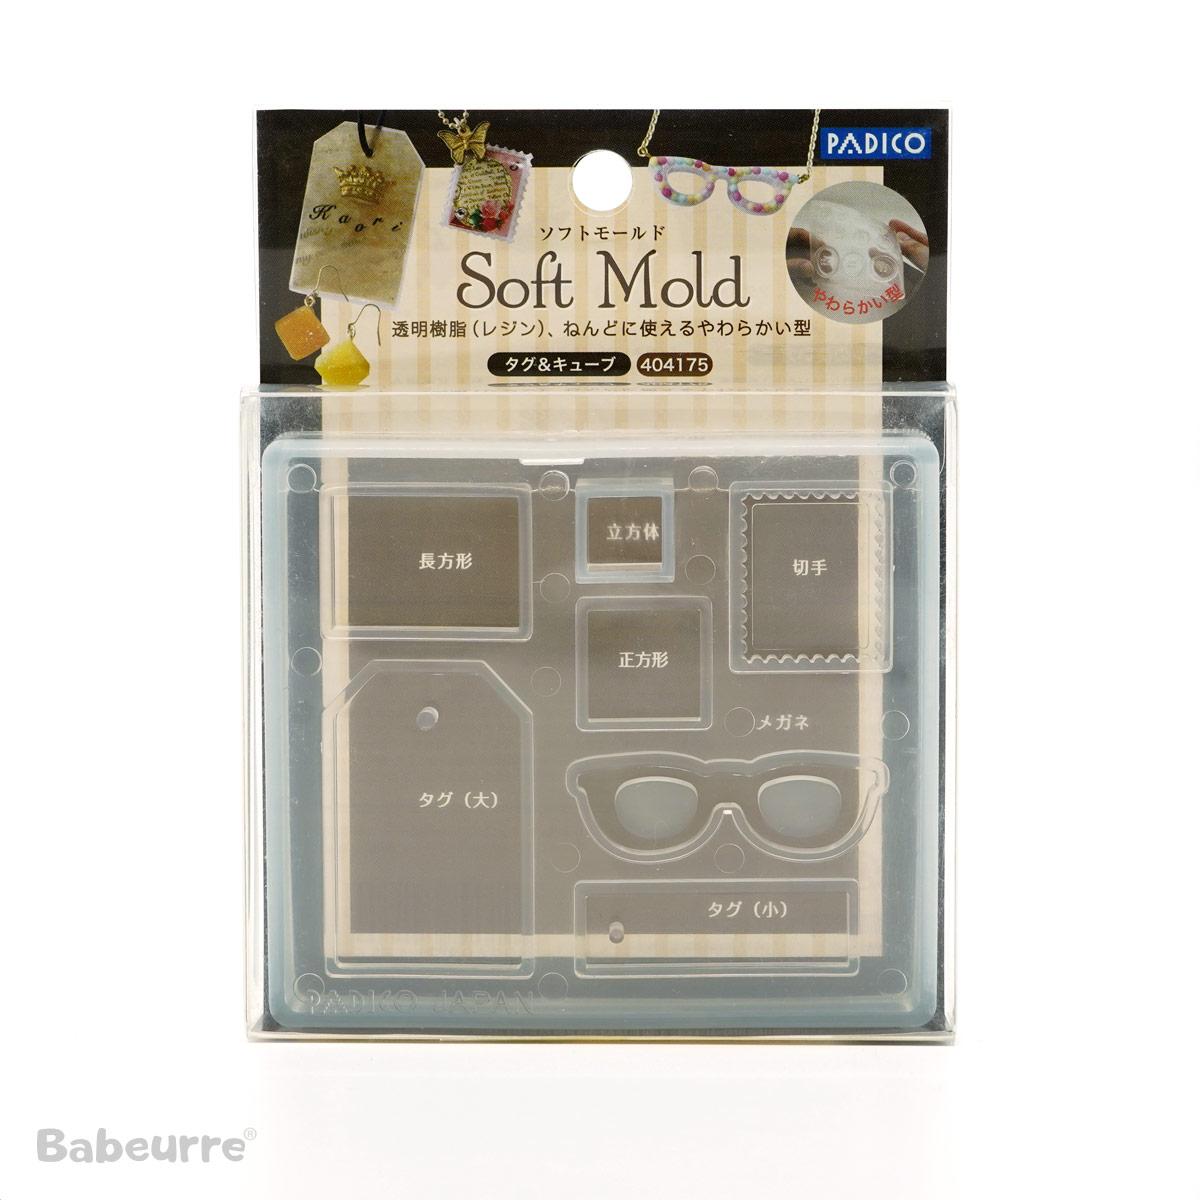 Padico Soft Mold Tag Cube